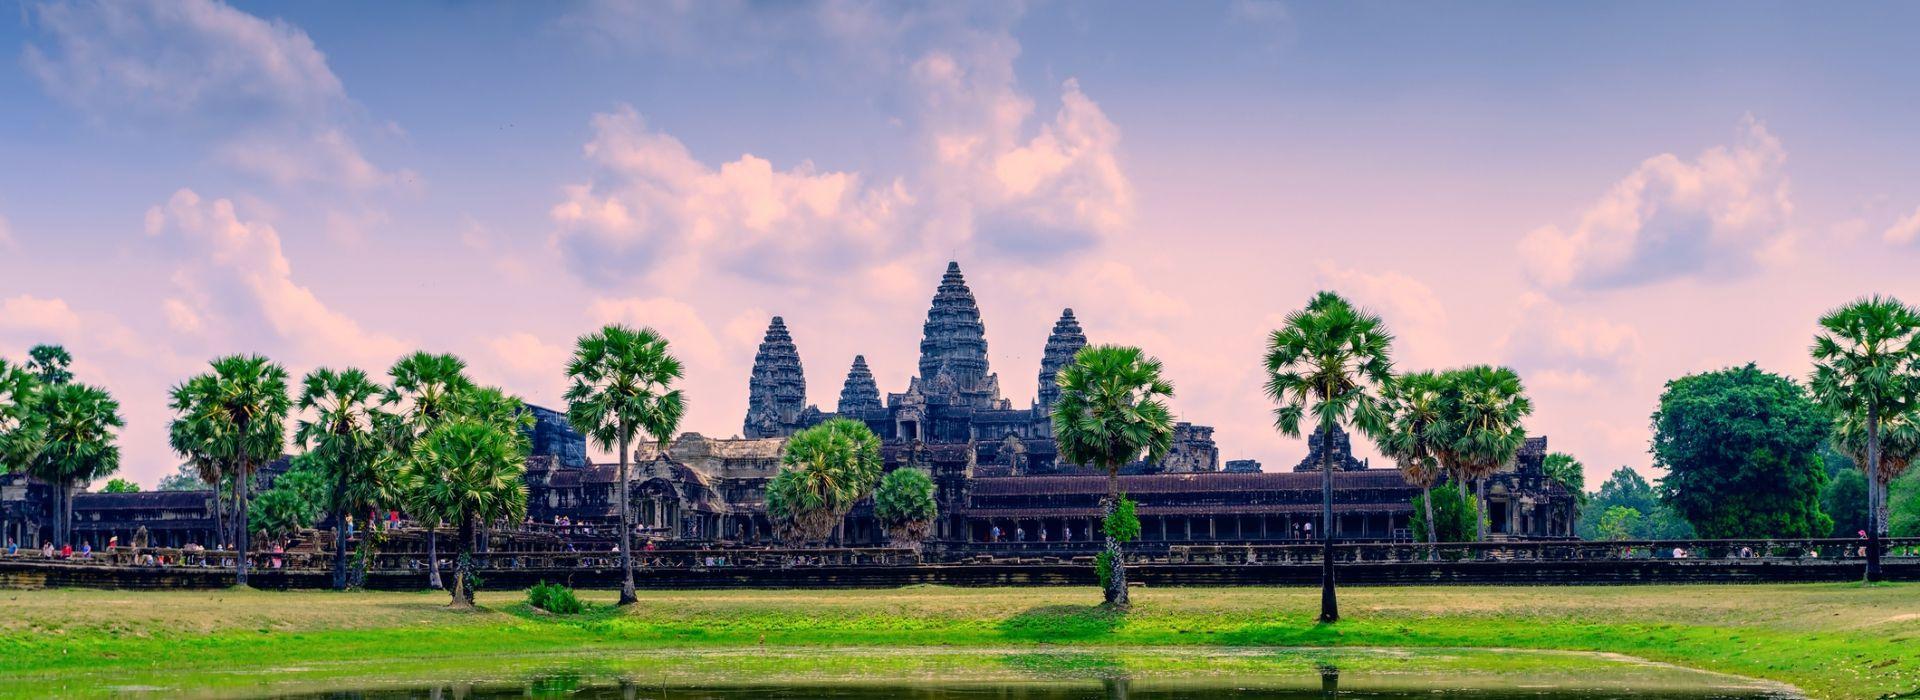 Sightseeing Tours in Siem Reap